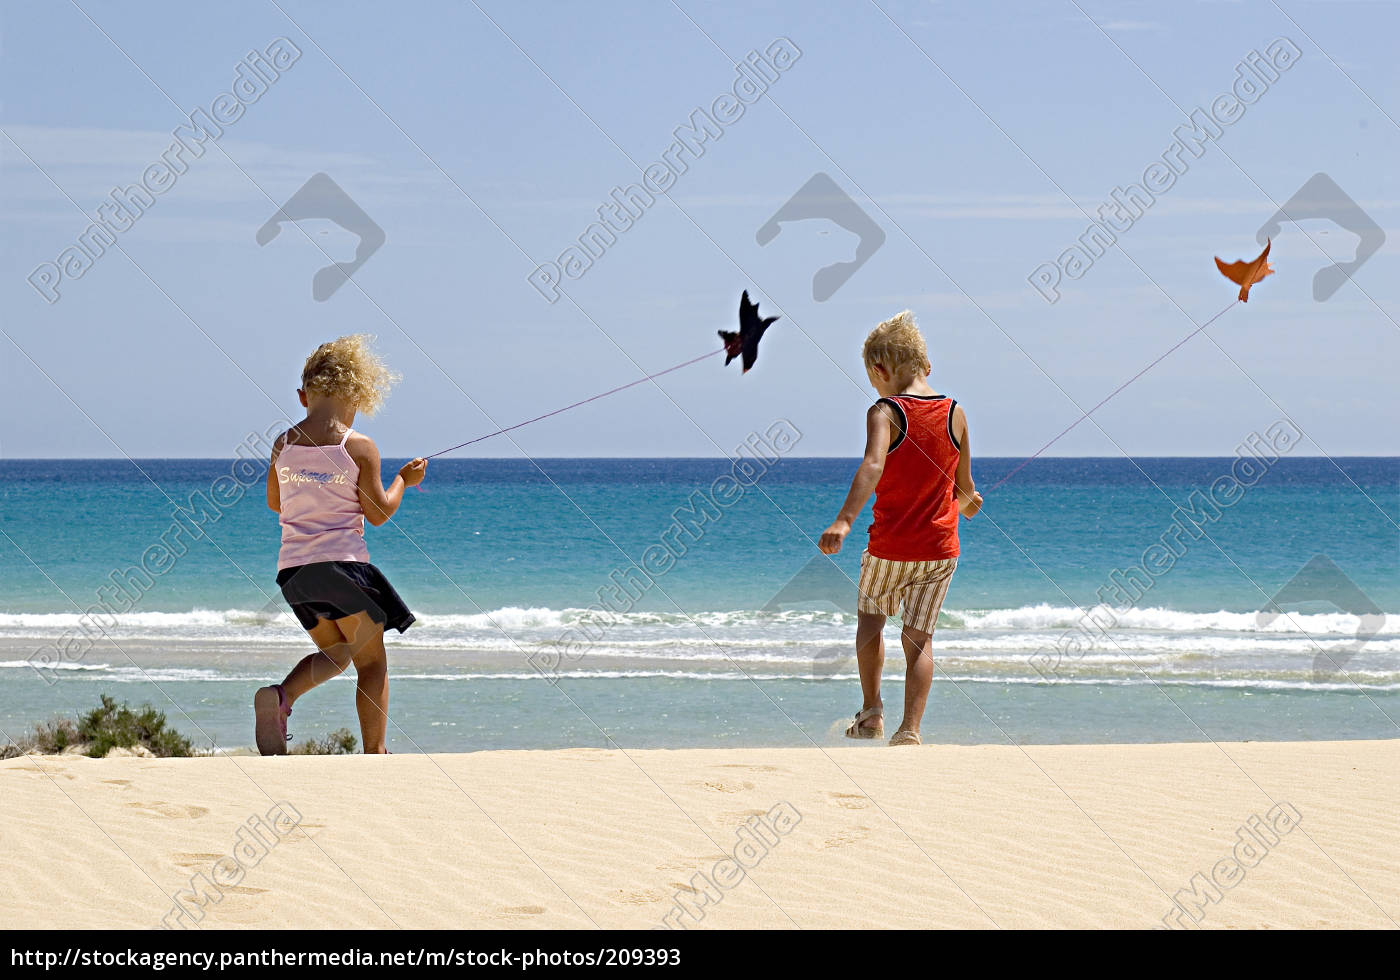 small, kites, at, the, beach - 209393